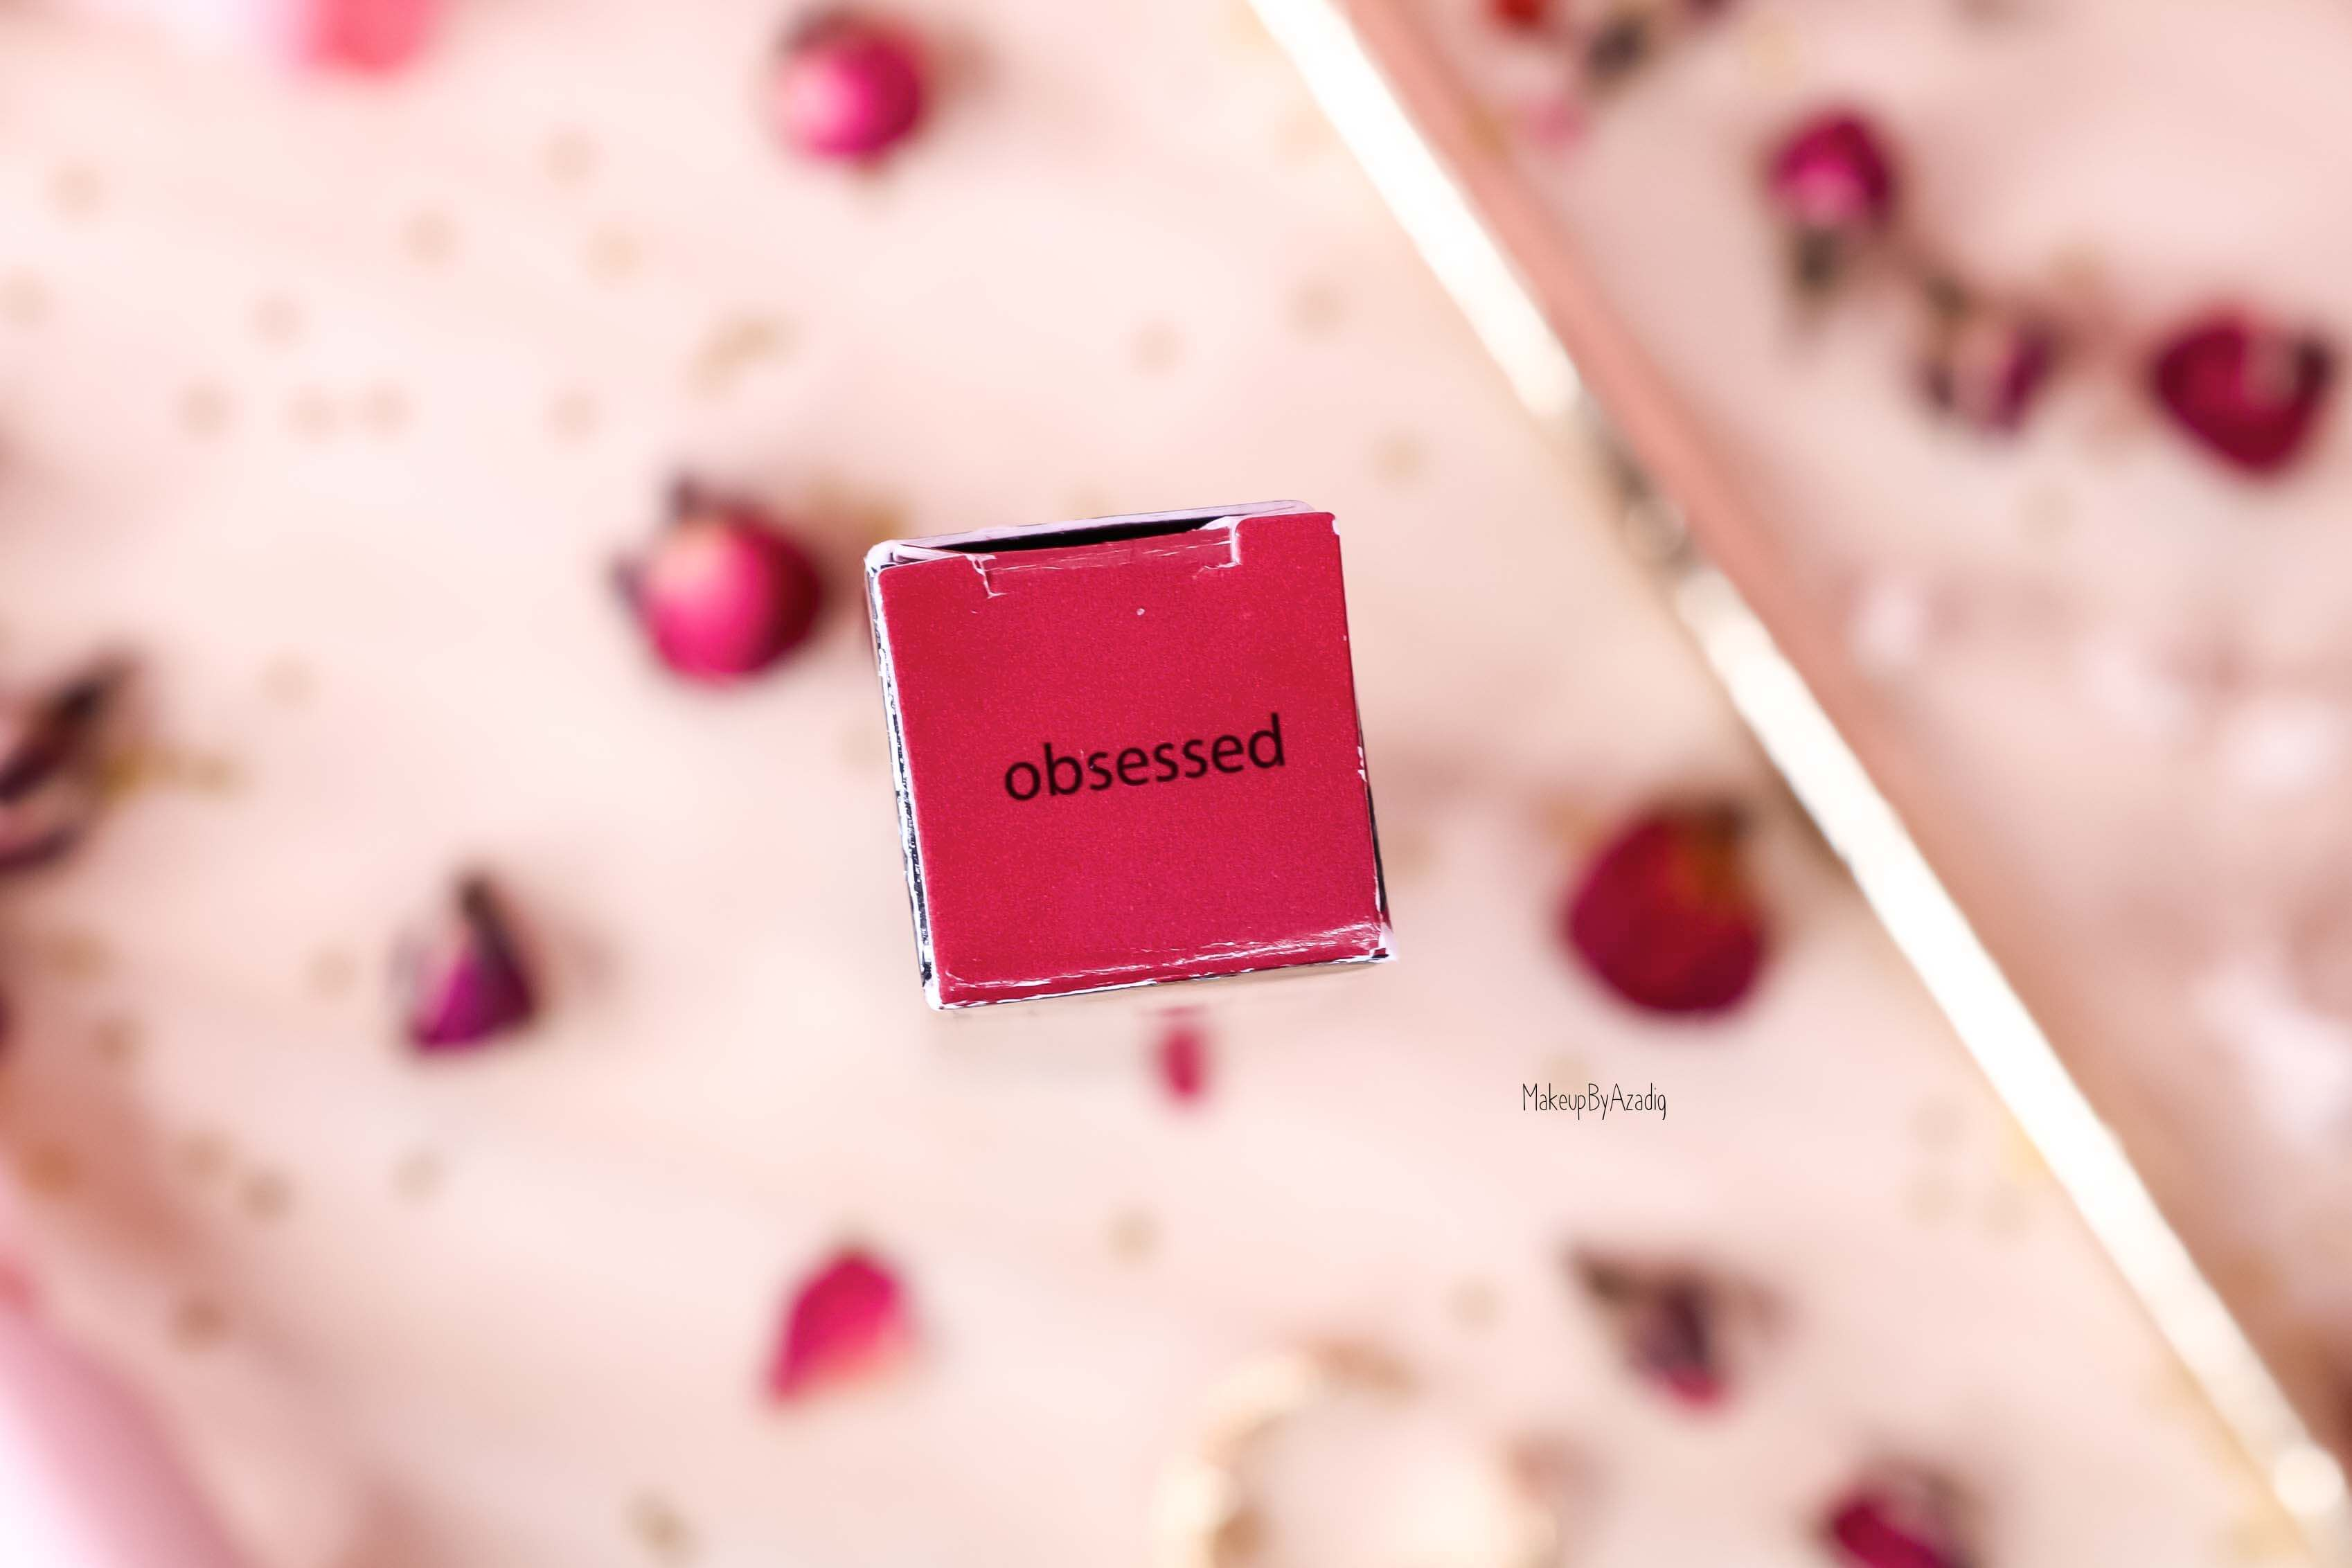 revue-rouge-a-levres-liquide-tarteist-matte-tarte-cosmetic-sephora-france-makeupbyazadig-obsessed-avis-prix-swatch-teinte